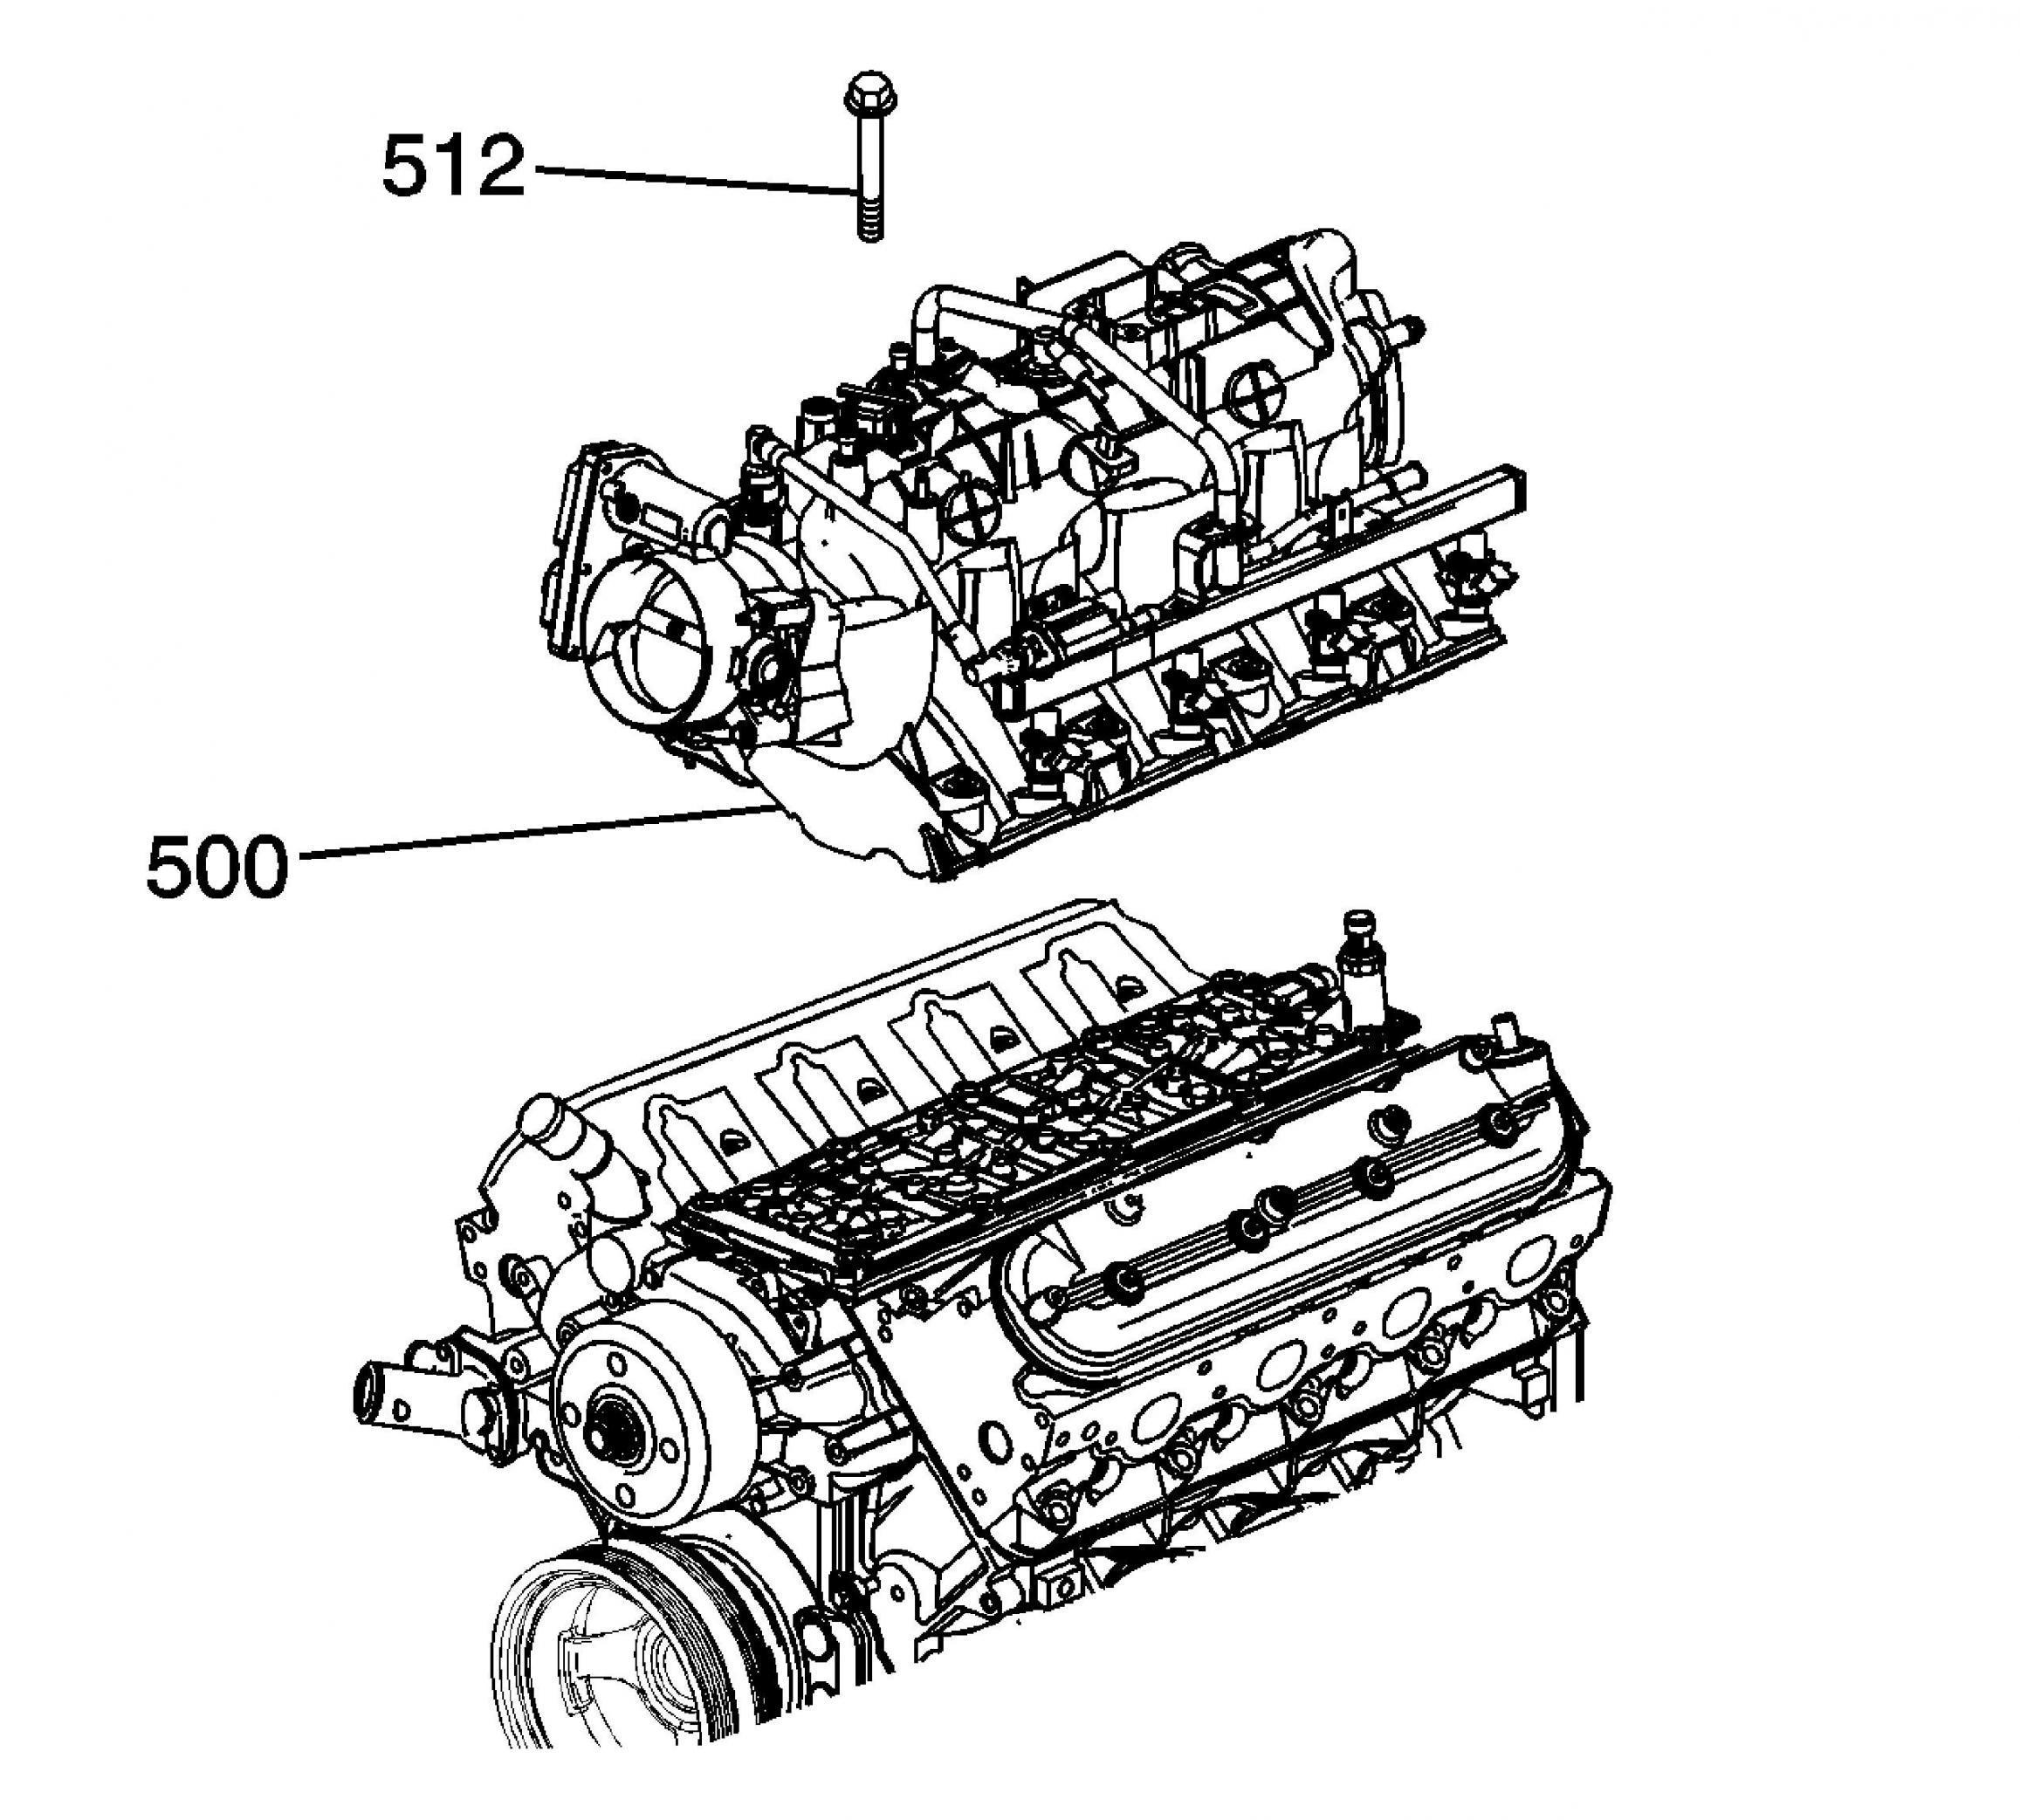 Service manual [2011 Chevrolet Suburban Intake Removal